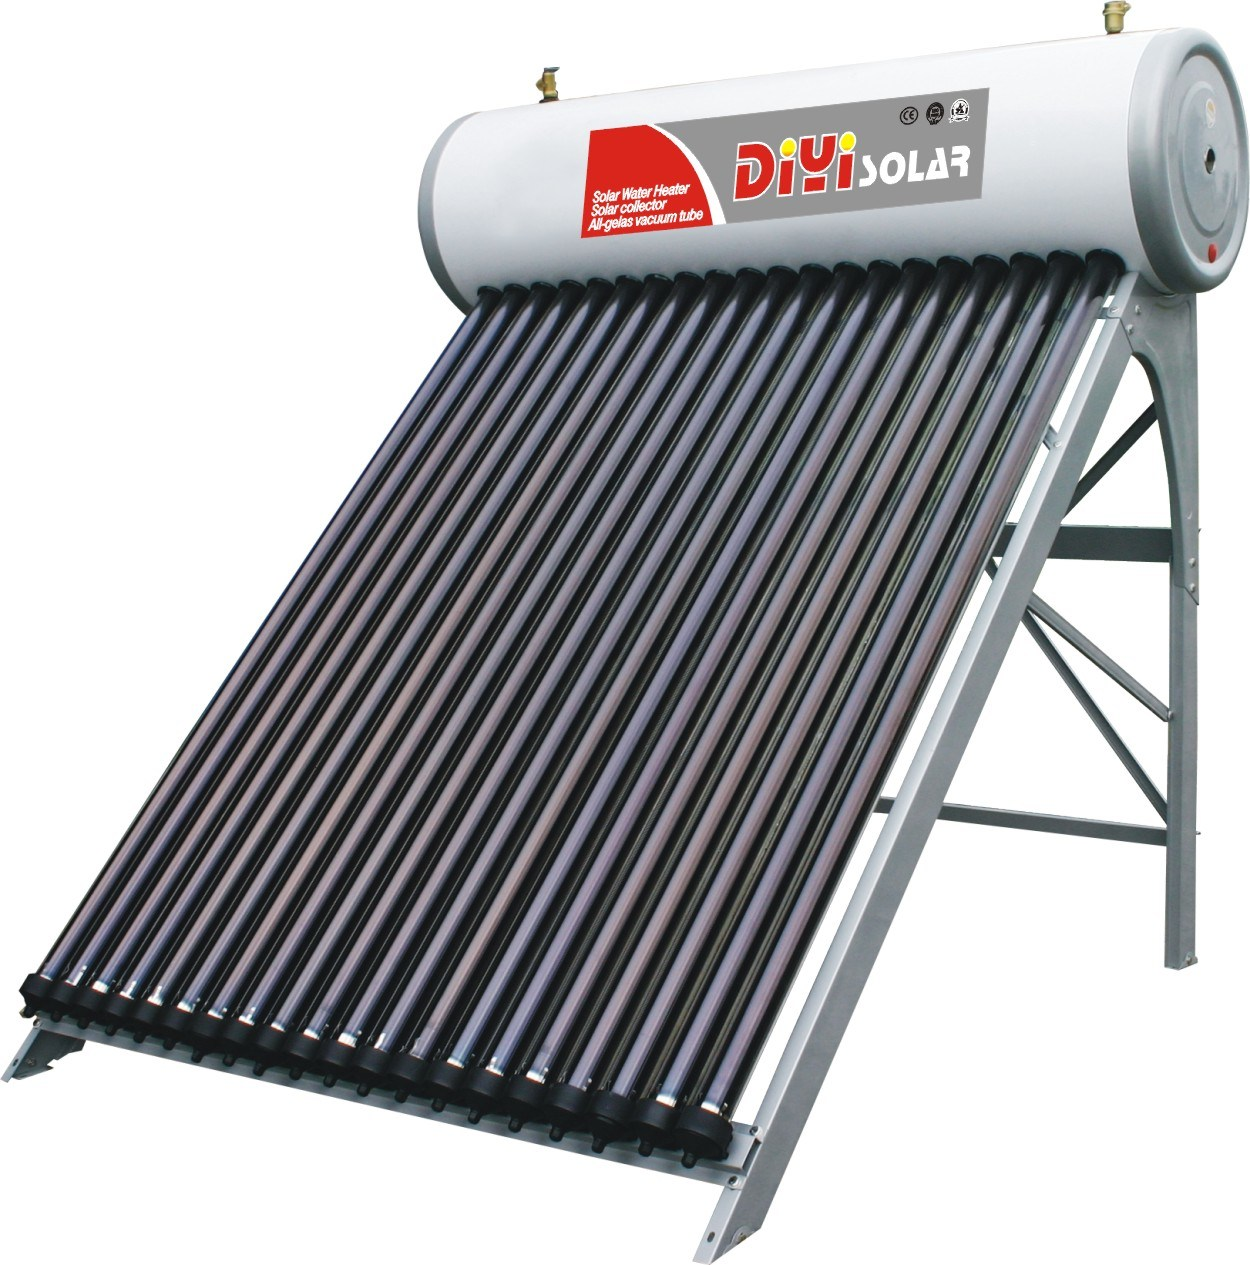 China High Pressure Solar Geyser Diyi Ip01 20 China